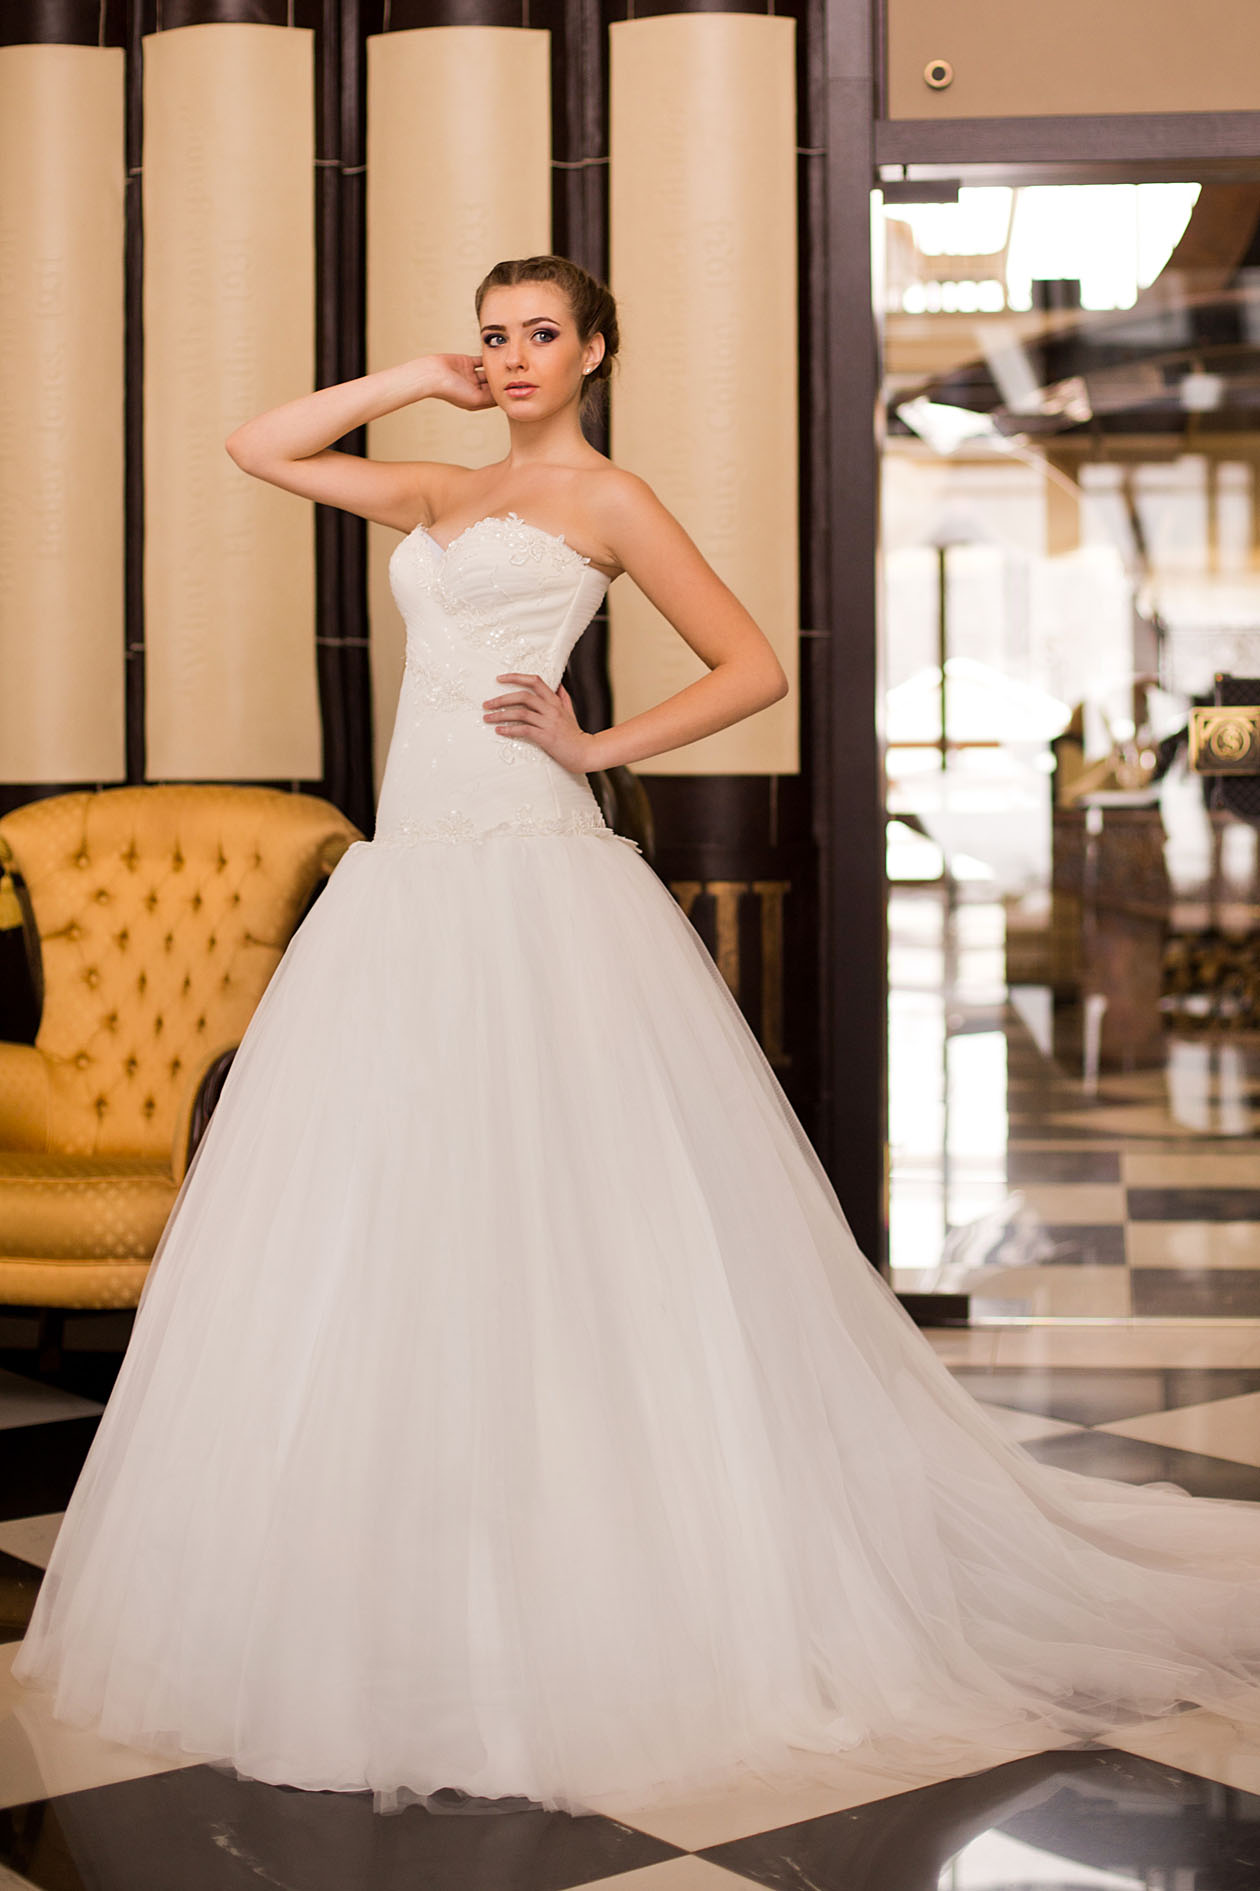 gсвадебное платье на заказ